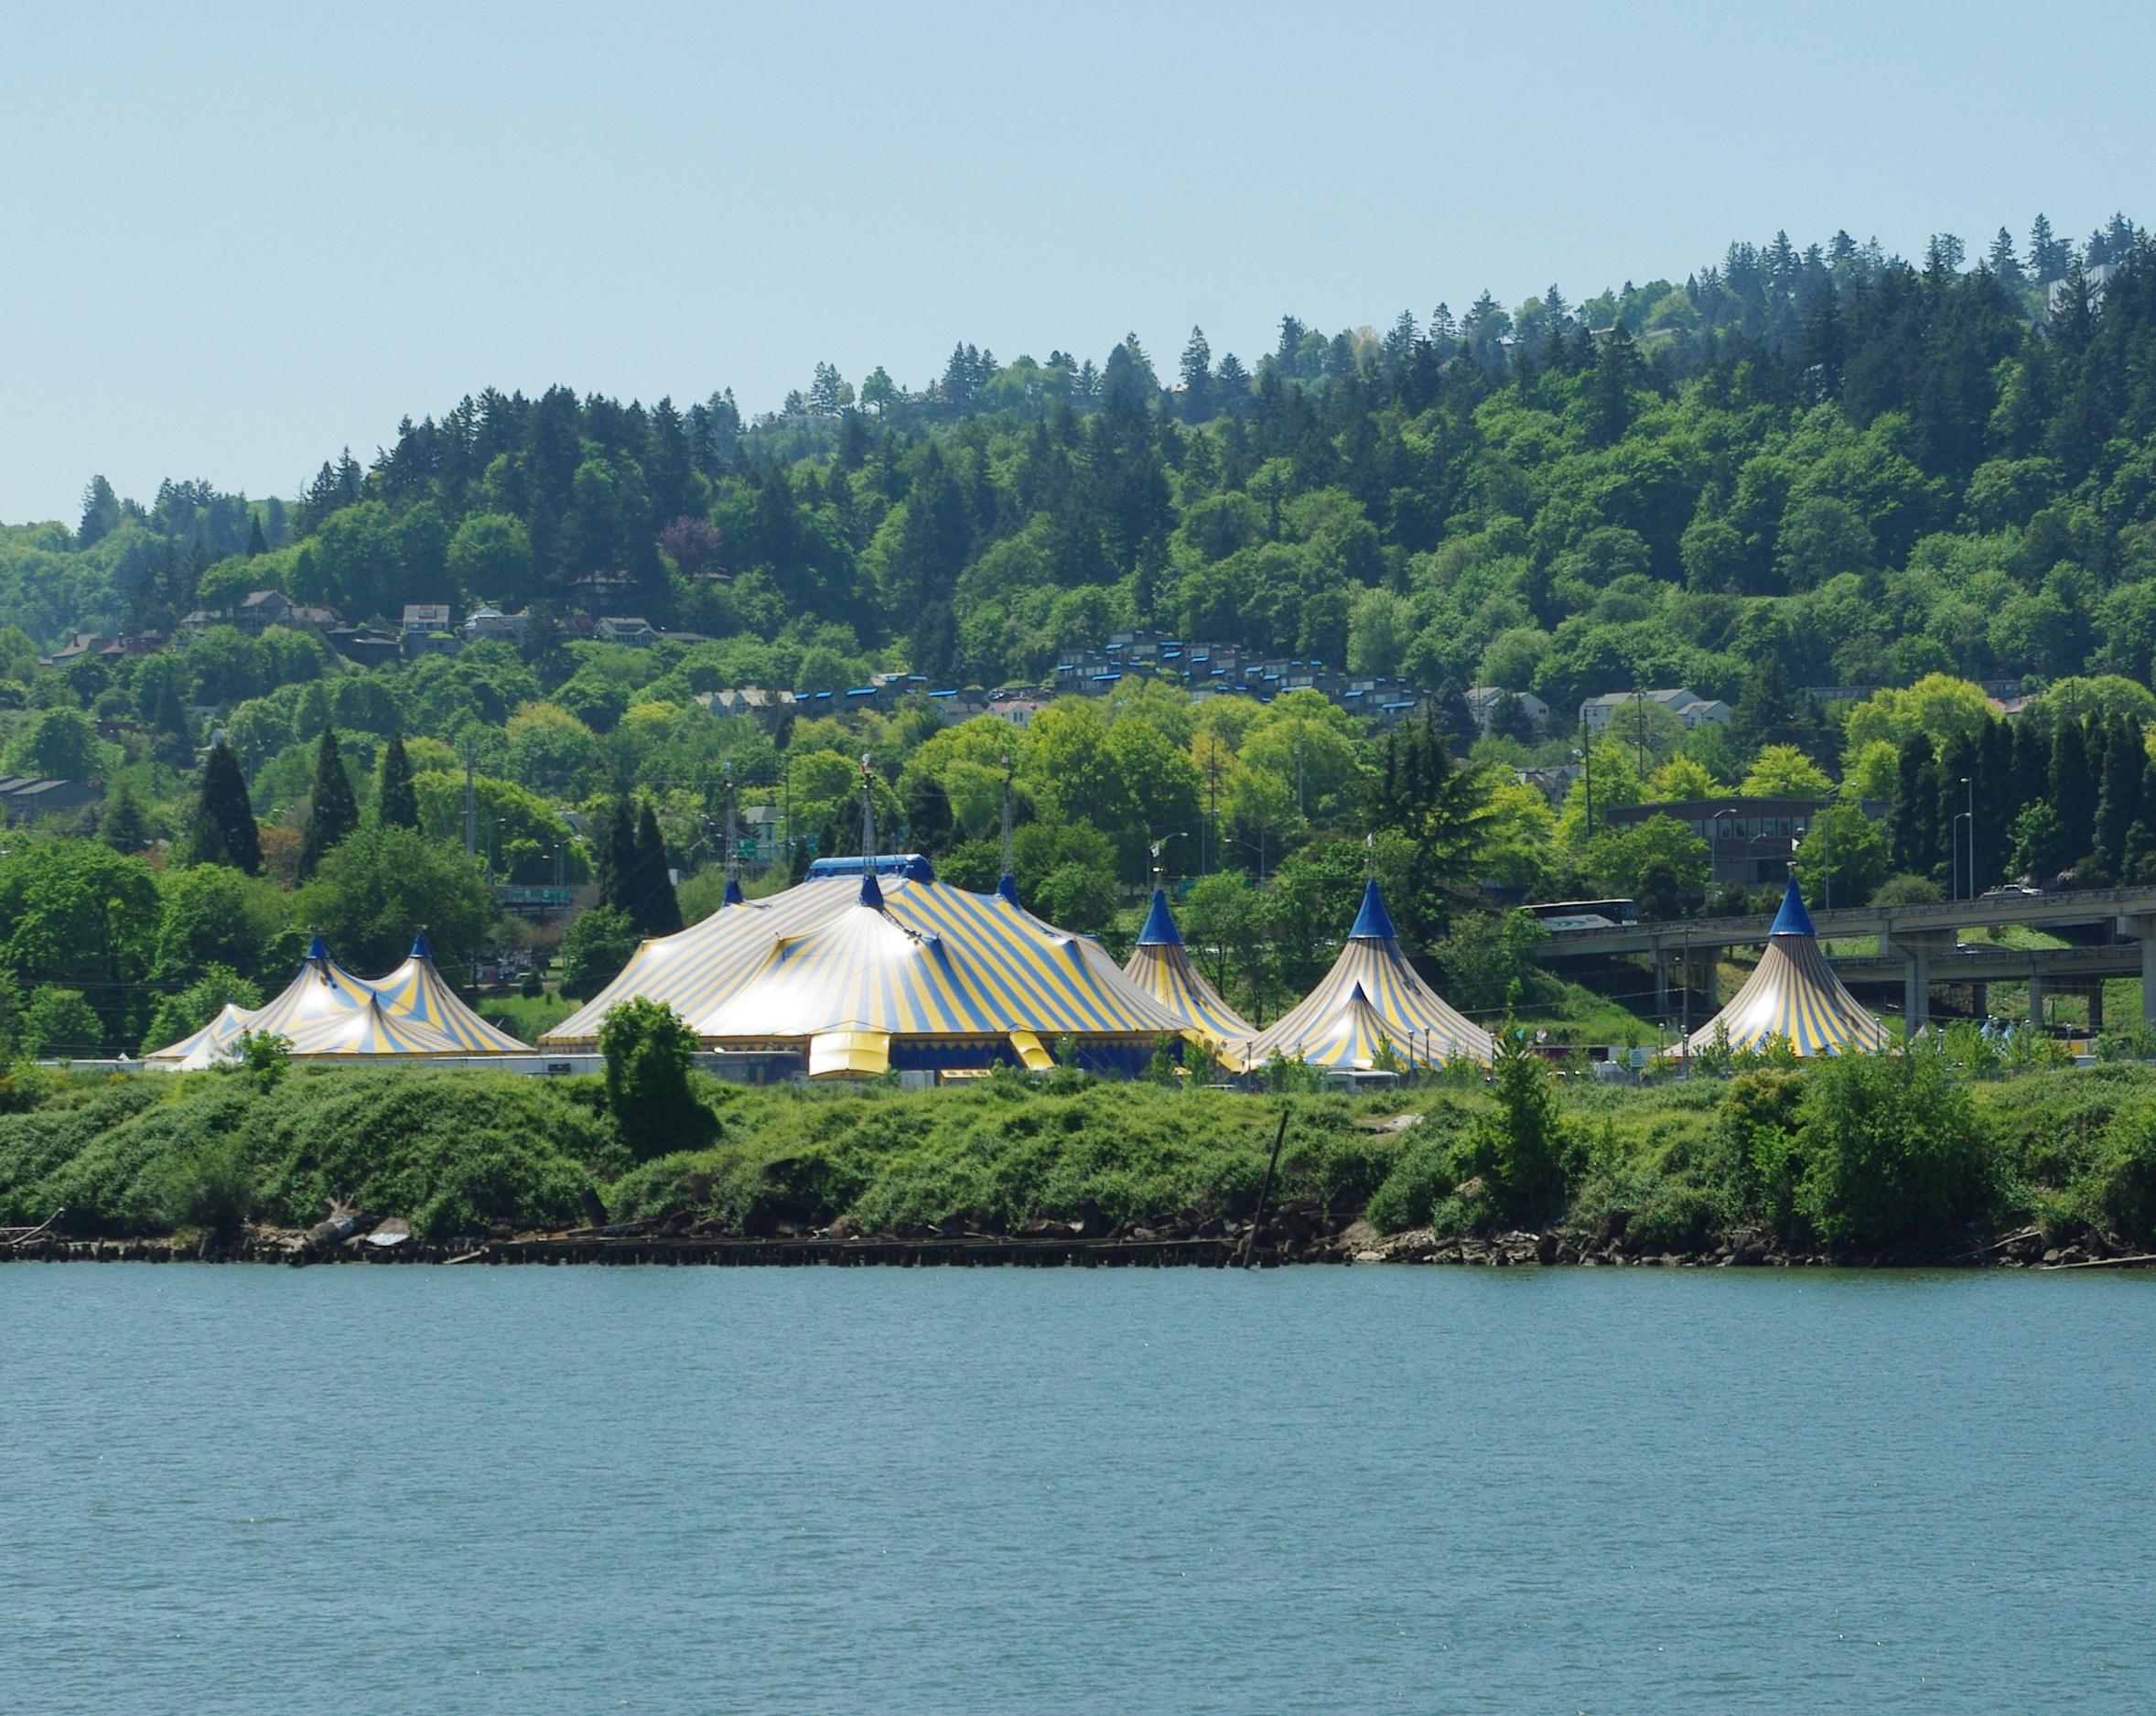 FileCirque du Soleil Kooza tent - Portland Oregon.JPG & File:Cirque du Soleil Kooza tent - Portland Oregon.JPG ...